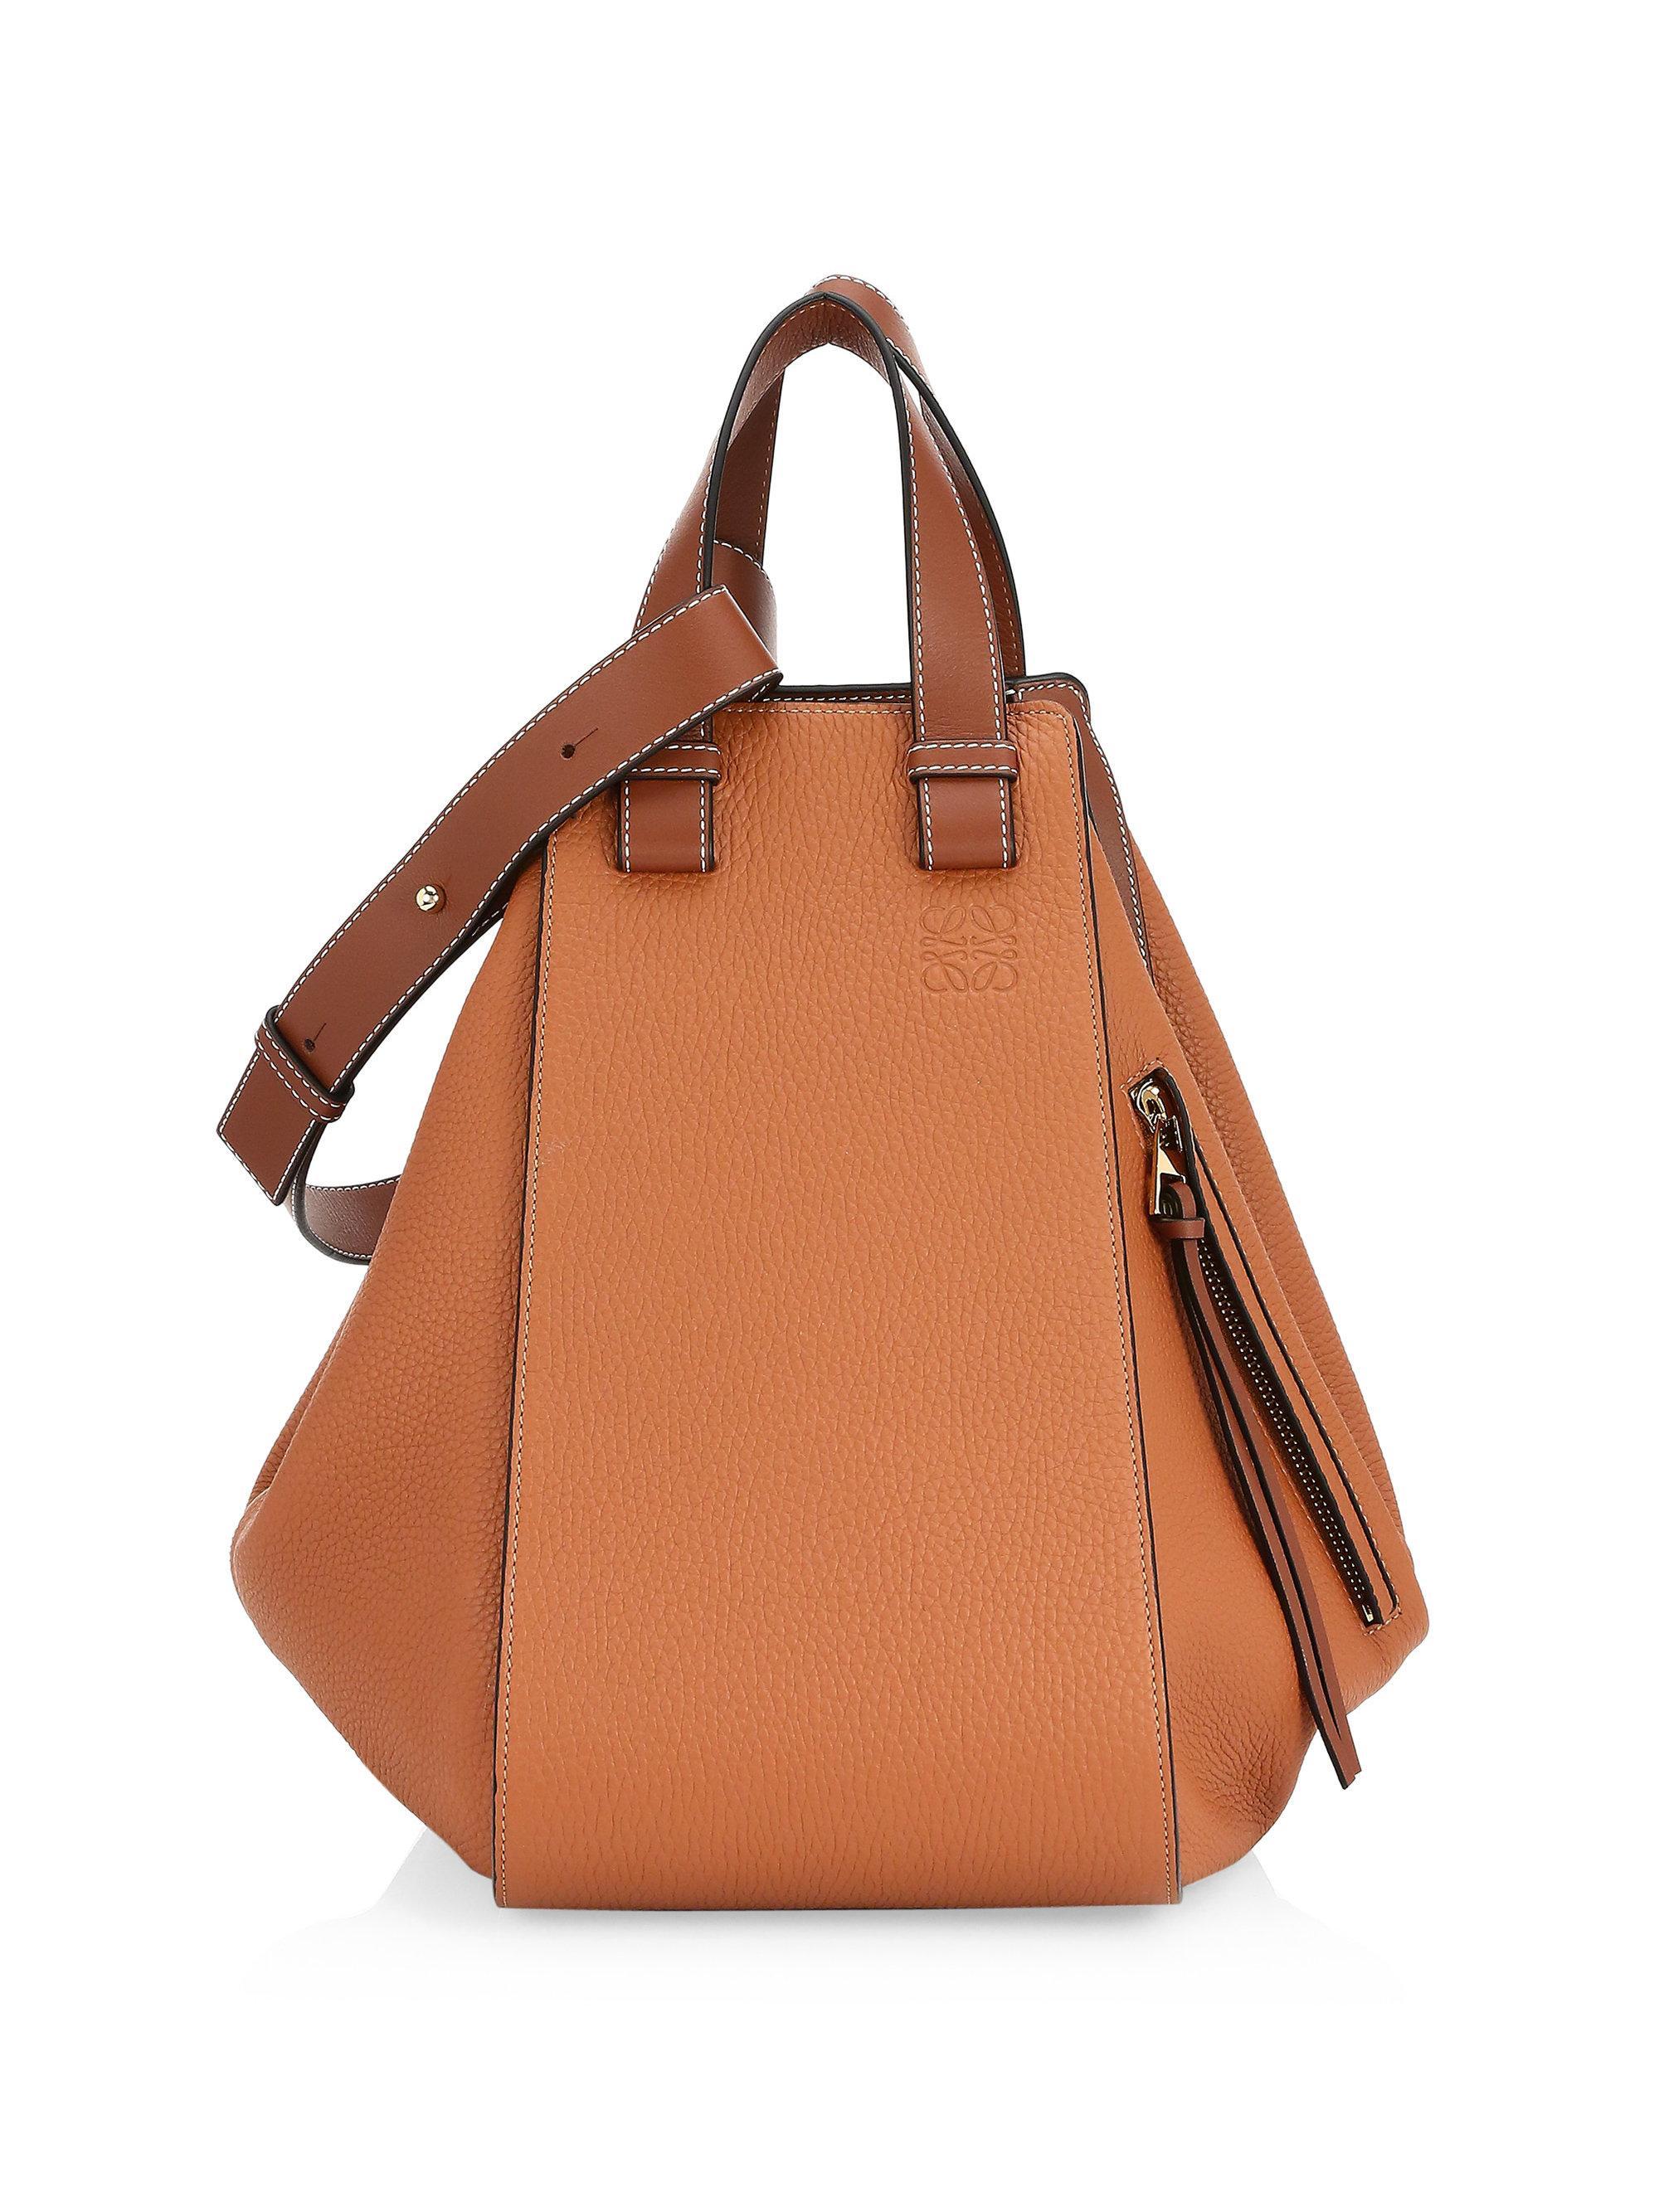 Loewe Large Hammock Bag in Brown - Lyst 26f60971e1130